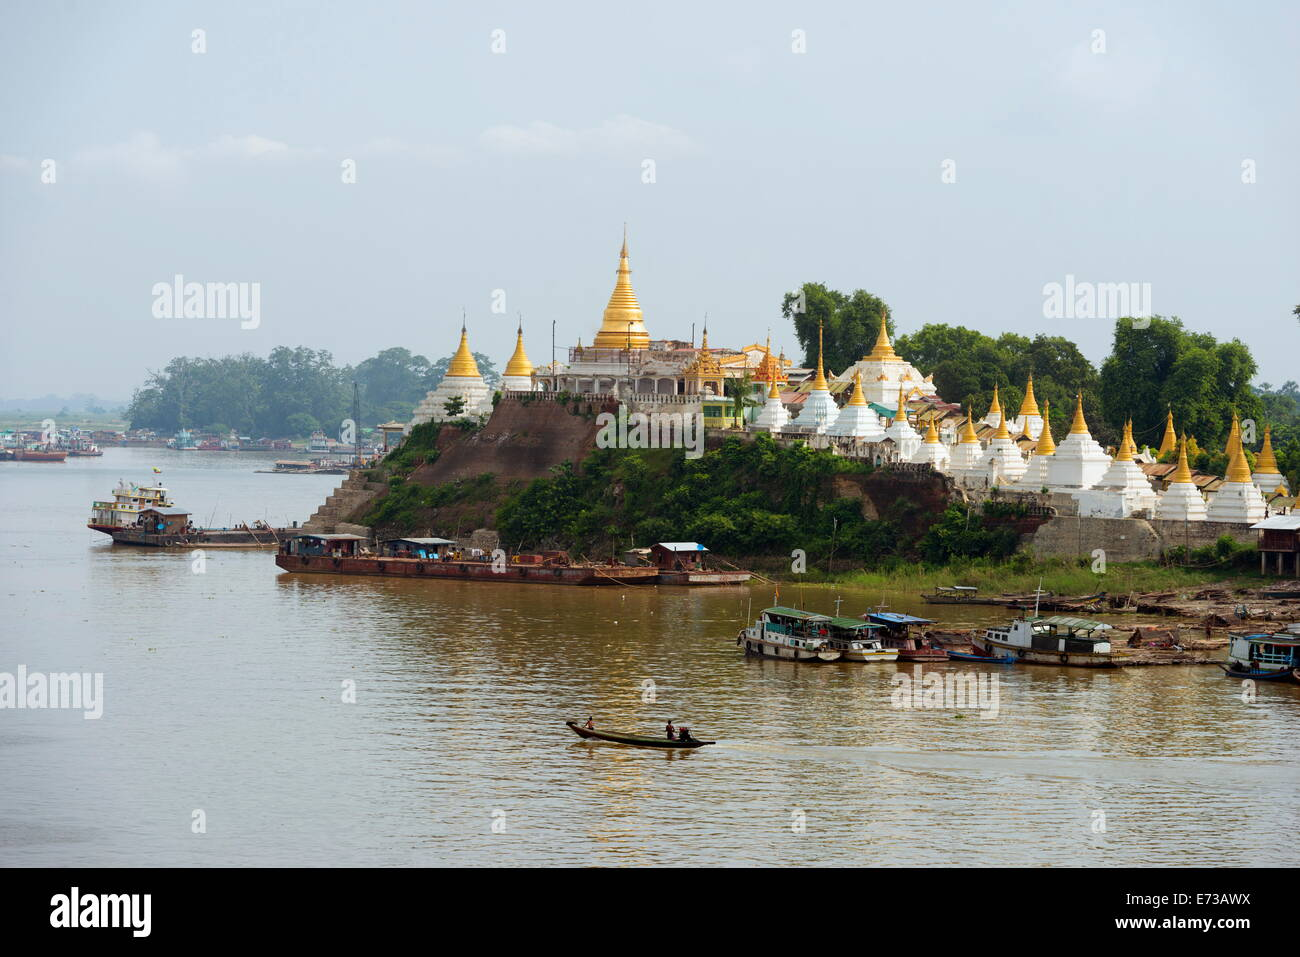 Shwe Kyet ancora il tempio e Ayeyarwady Irrawaddy (Fiume), Mandalay Myanmar (Birmania), Asia Immagini Stock